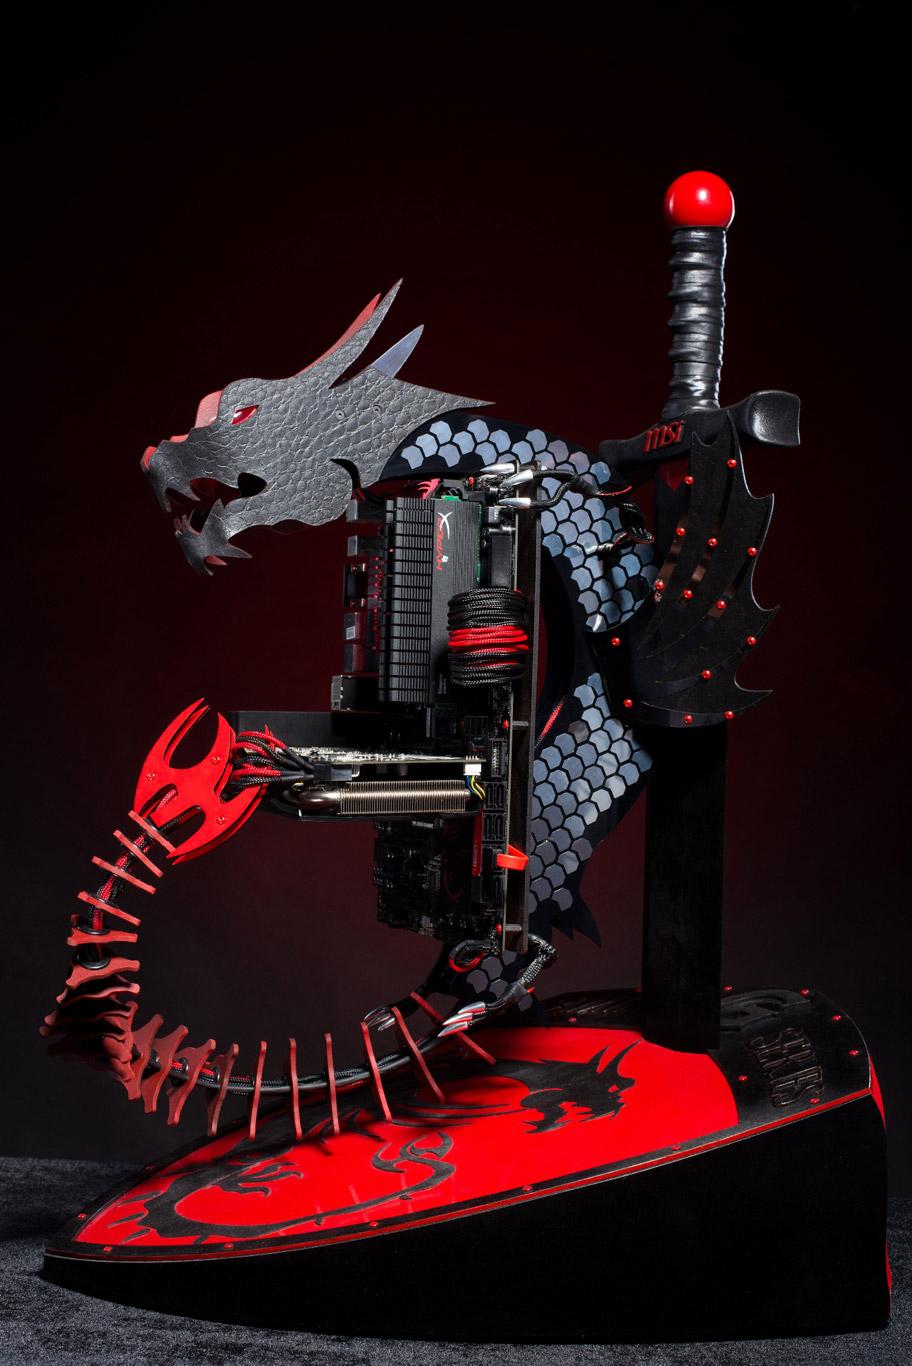 Un mod MSI dragon